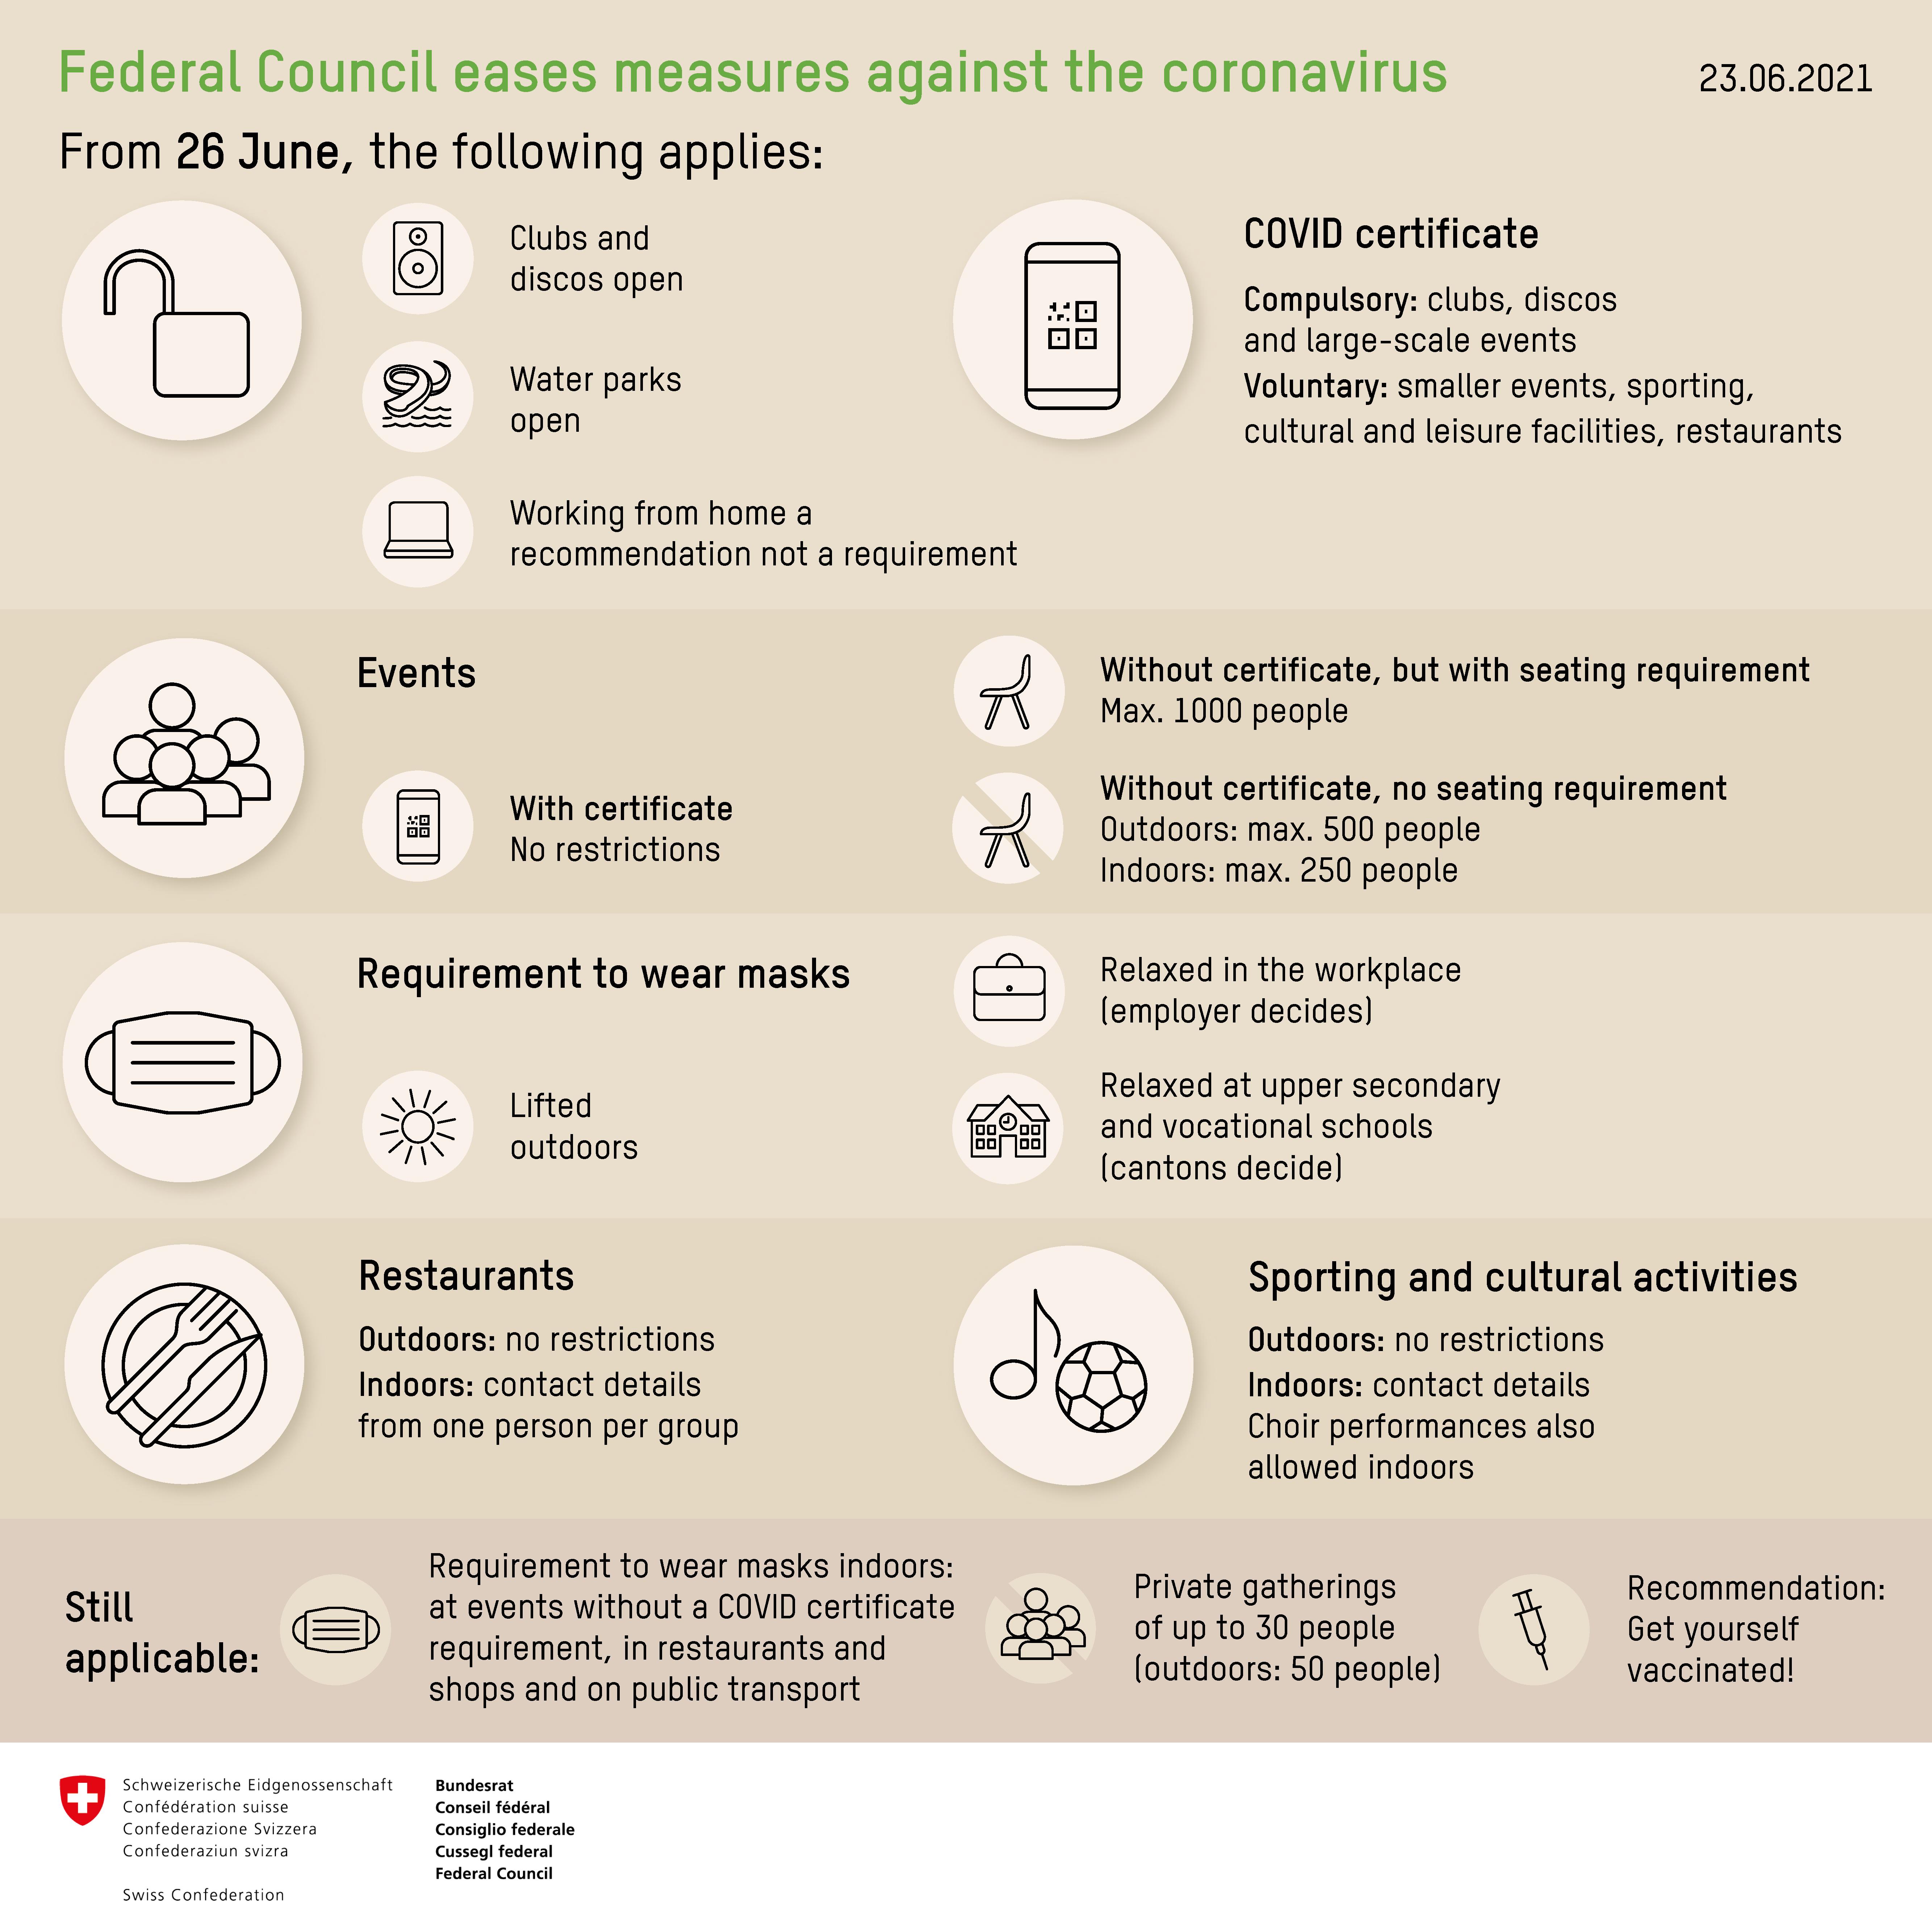 Coronavirus: Measures and ordinances